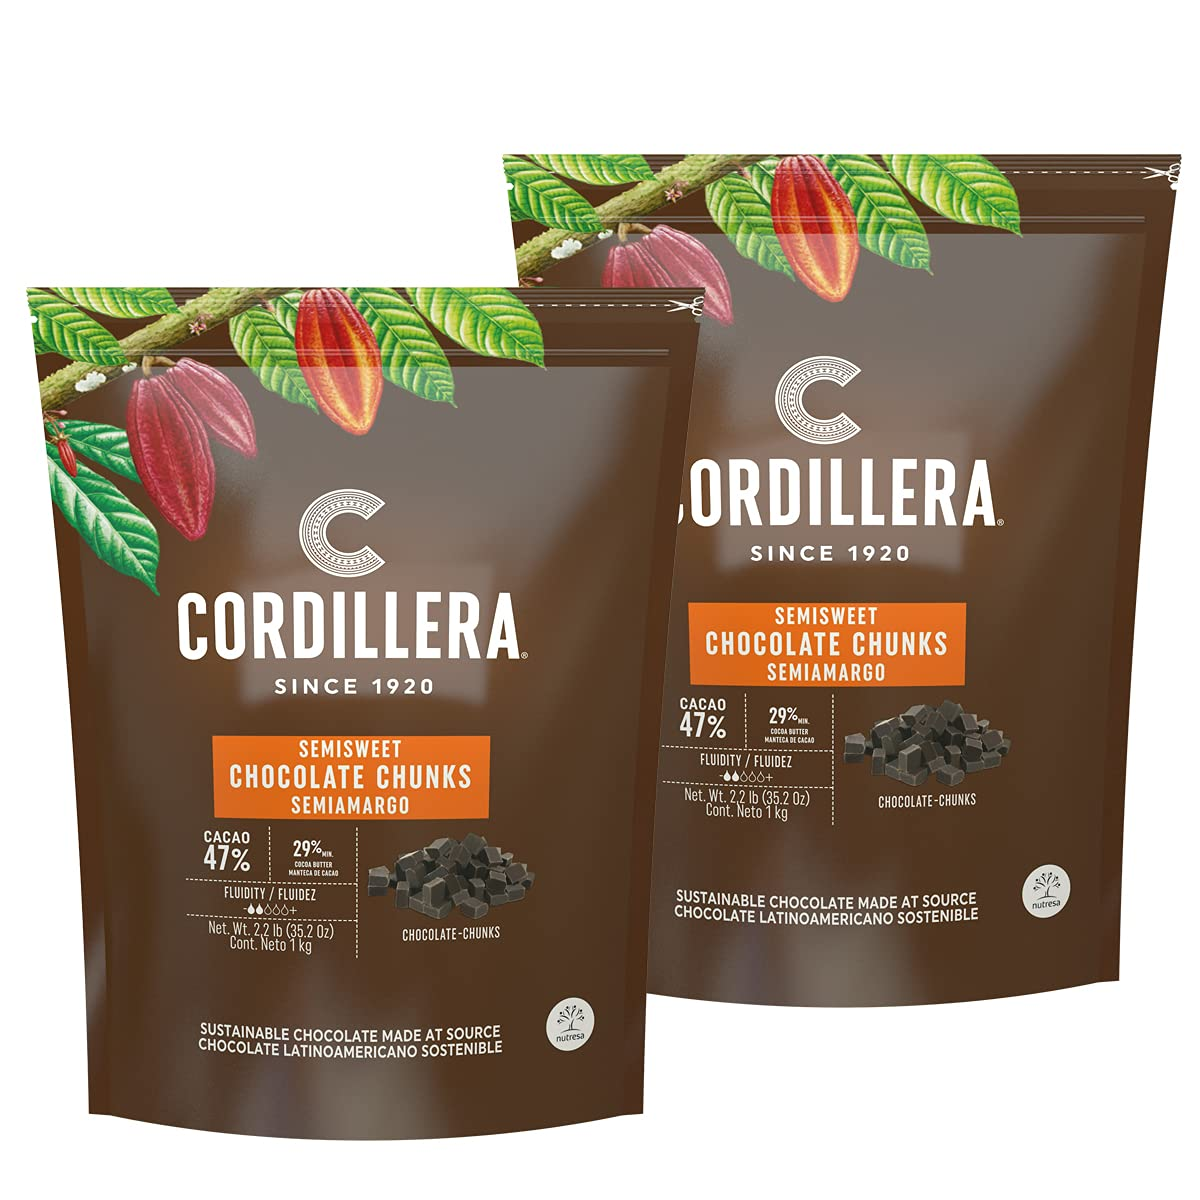 Cordillera | Semisweet Chocolate Chunks 47% | 2.2 Lb (Pack of 2)